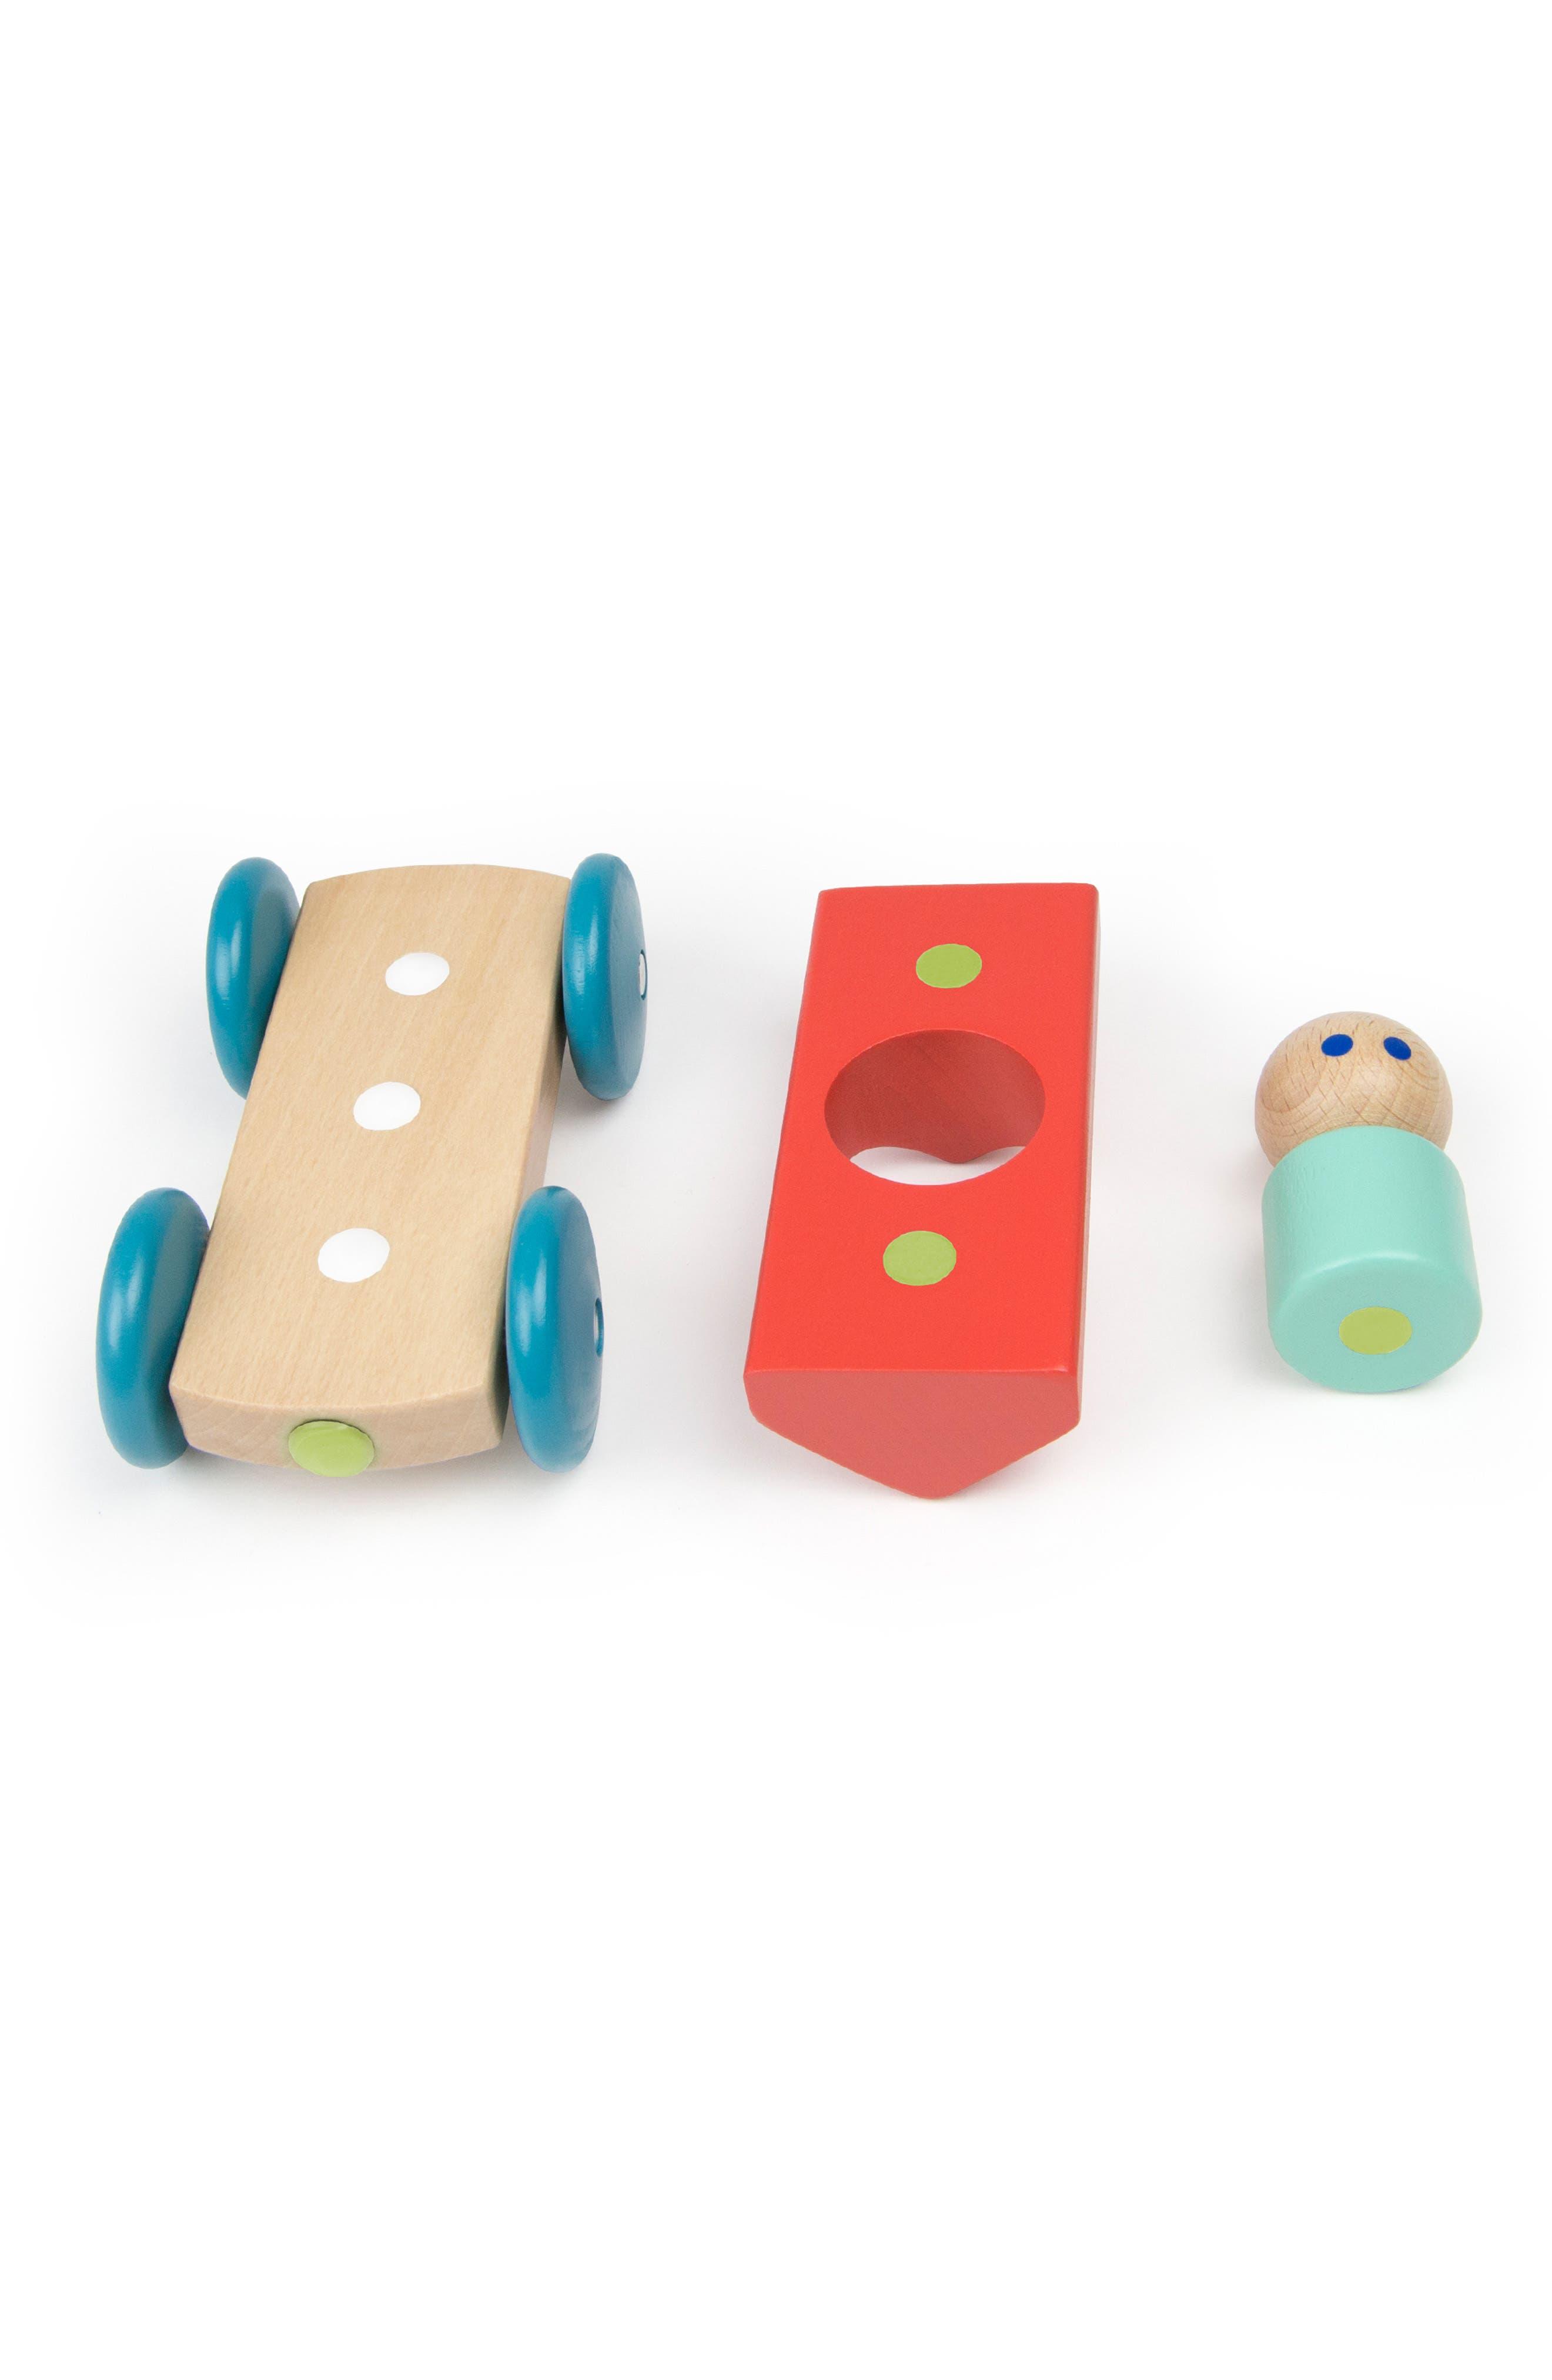 Barn Magnetic Racer Toy,                             Alternate thumbnail 8, color,                             RAINBOW